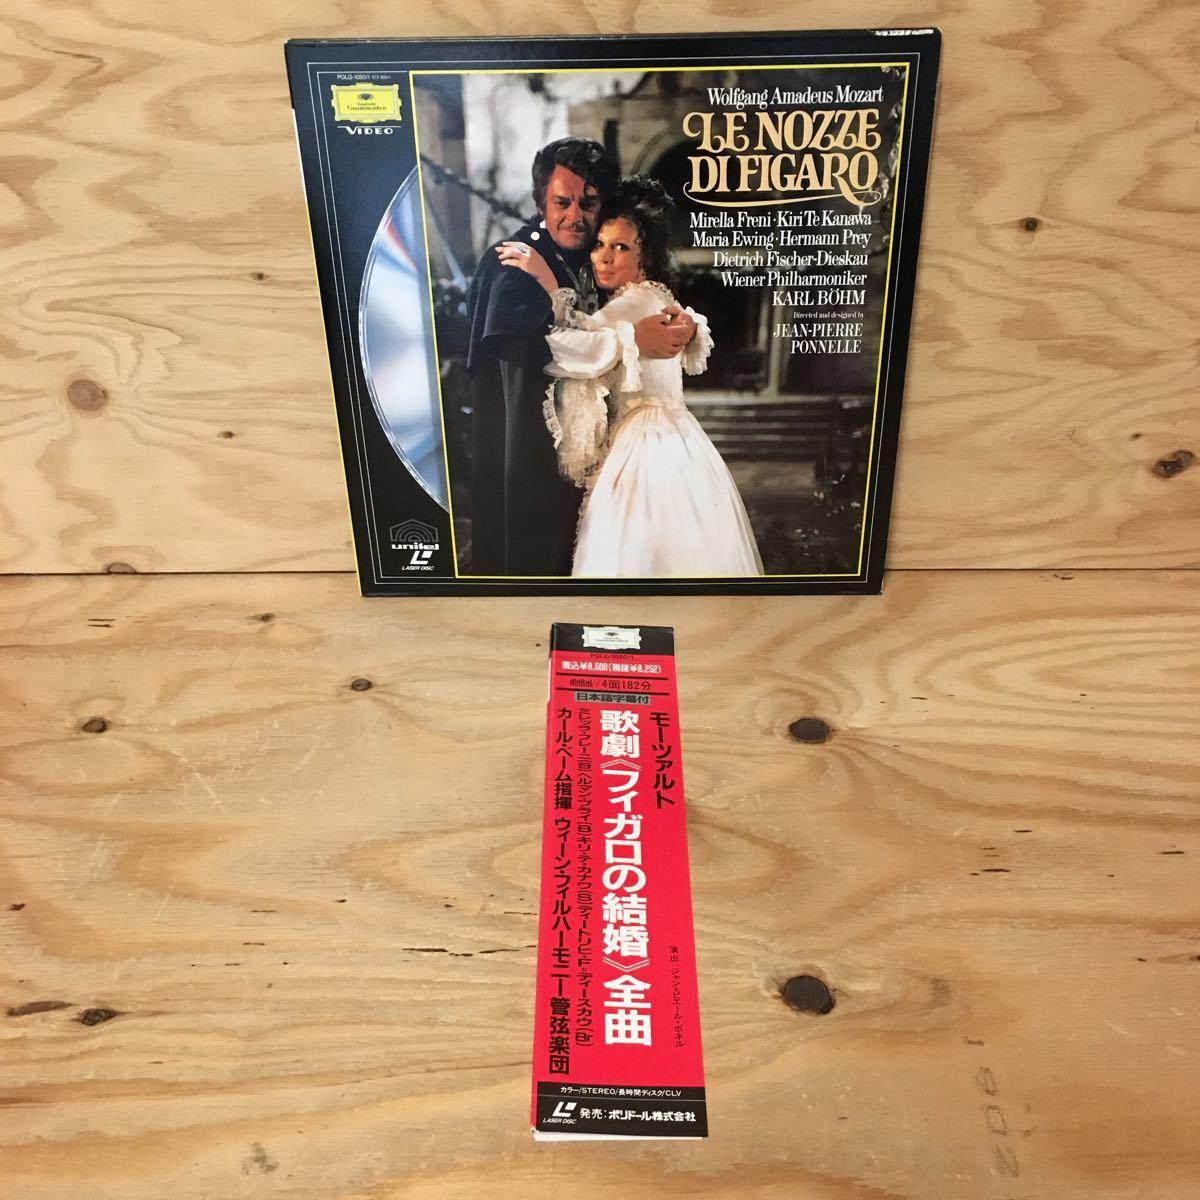 ◎Y3FIID-200305 レア[モーツァルト:歌劇 フィガロの結婚 全曲 LE NOZZE DI FIGARO]LD レーザーディスク ジャン=ピエール・ポネル _画像1